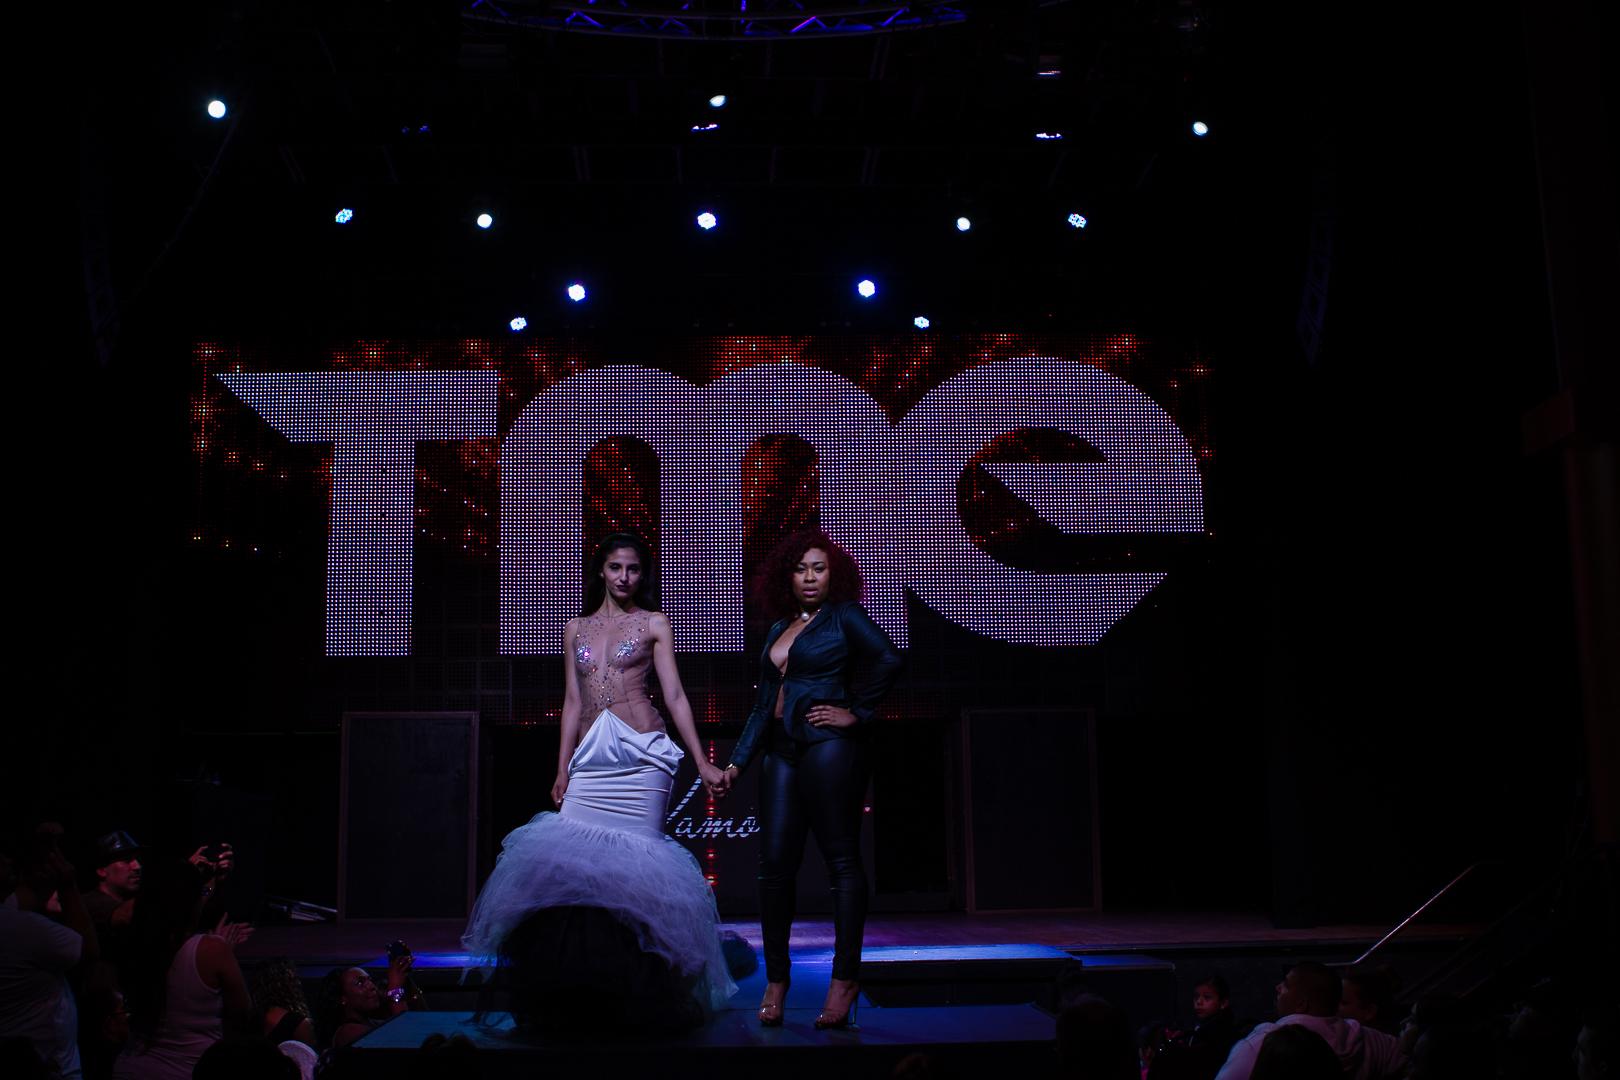 jonathanchia.com - The Model Experience Yost Theater-458